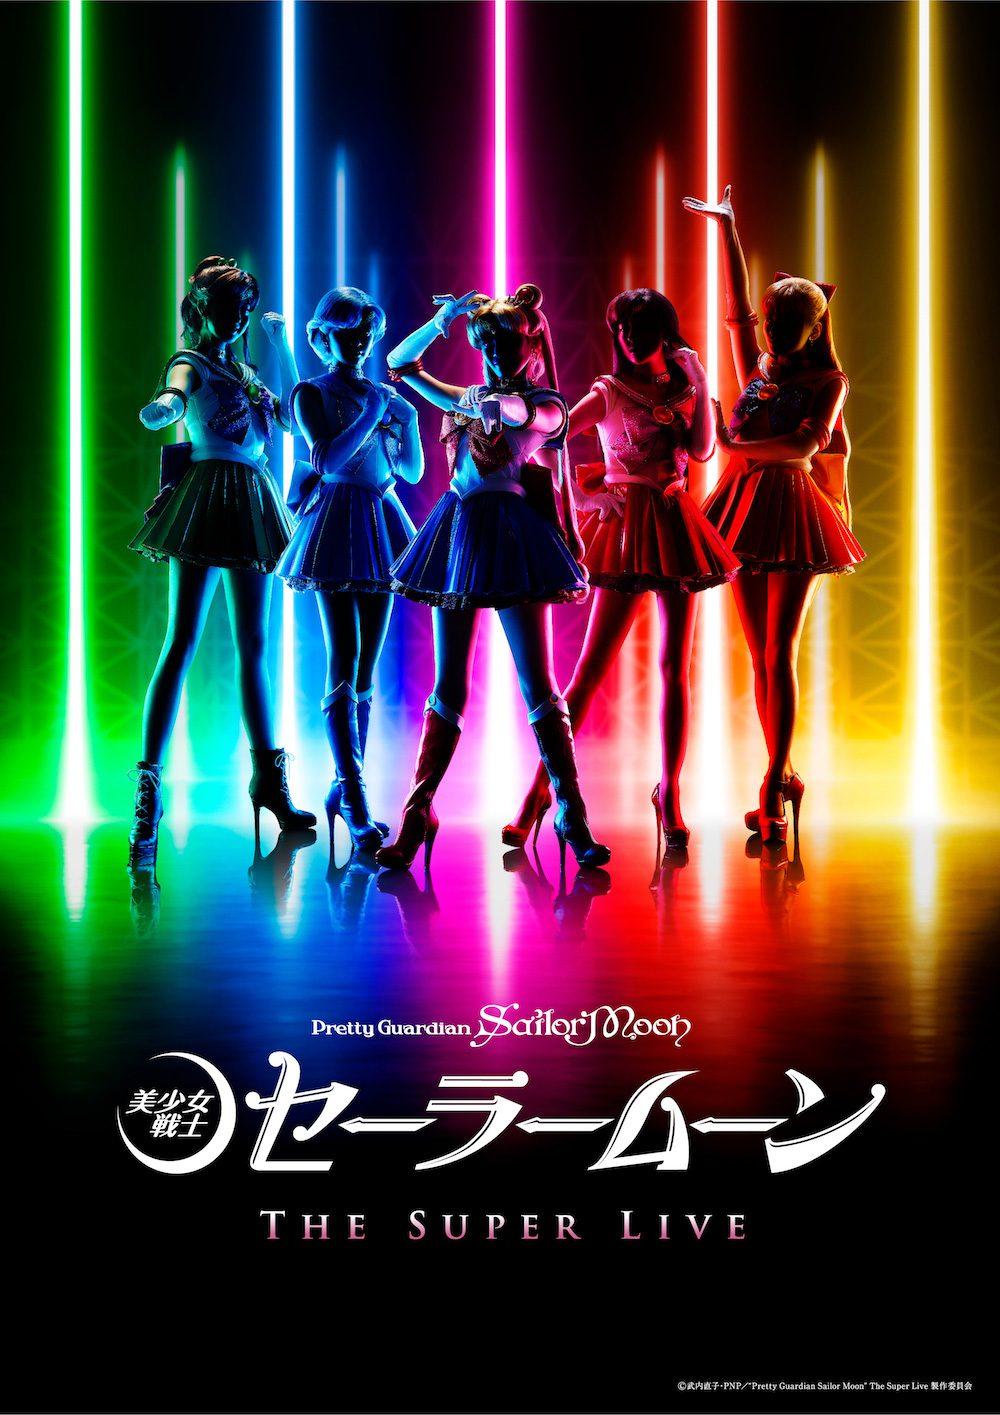 Sailor Moon The Super Live' Reveals Their Official Cast